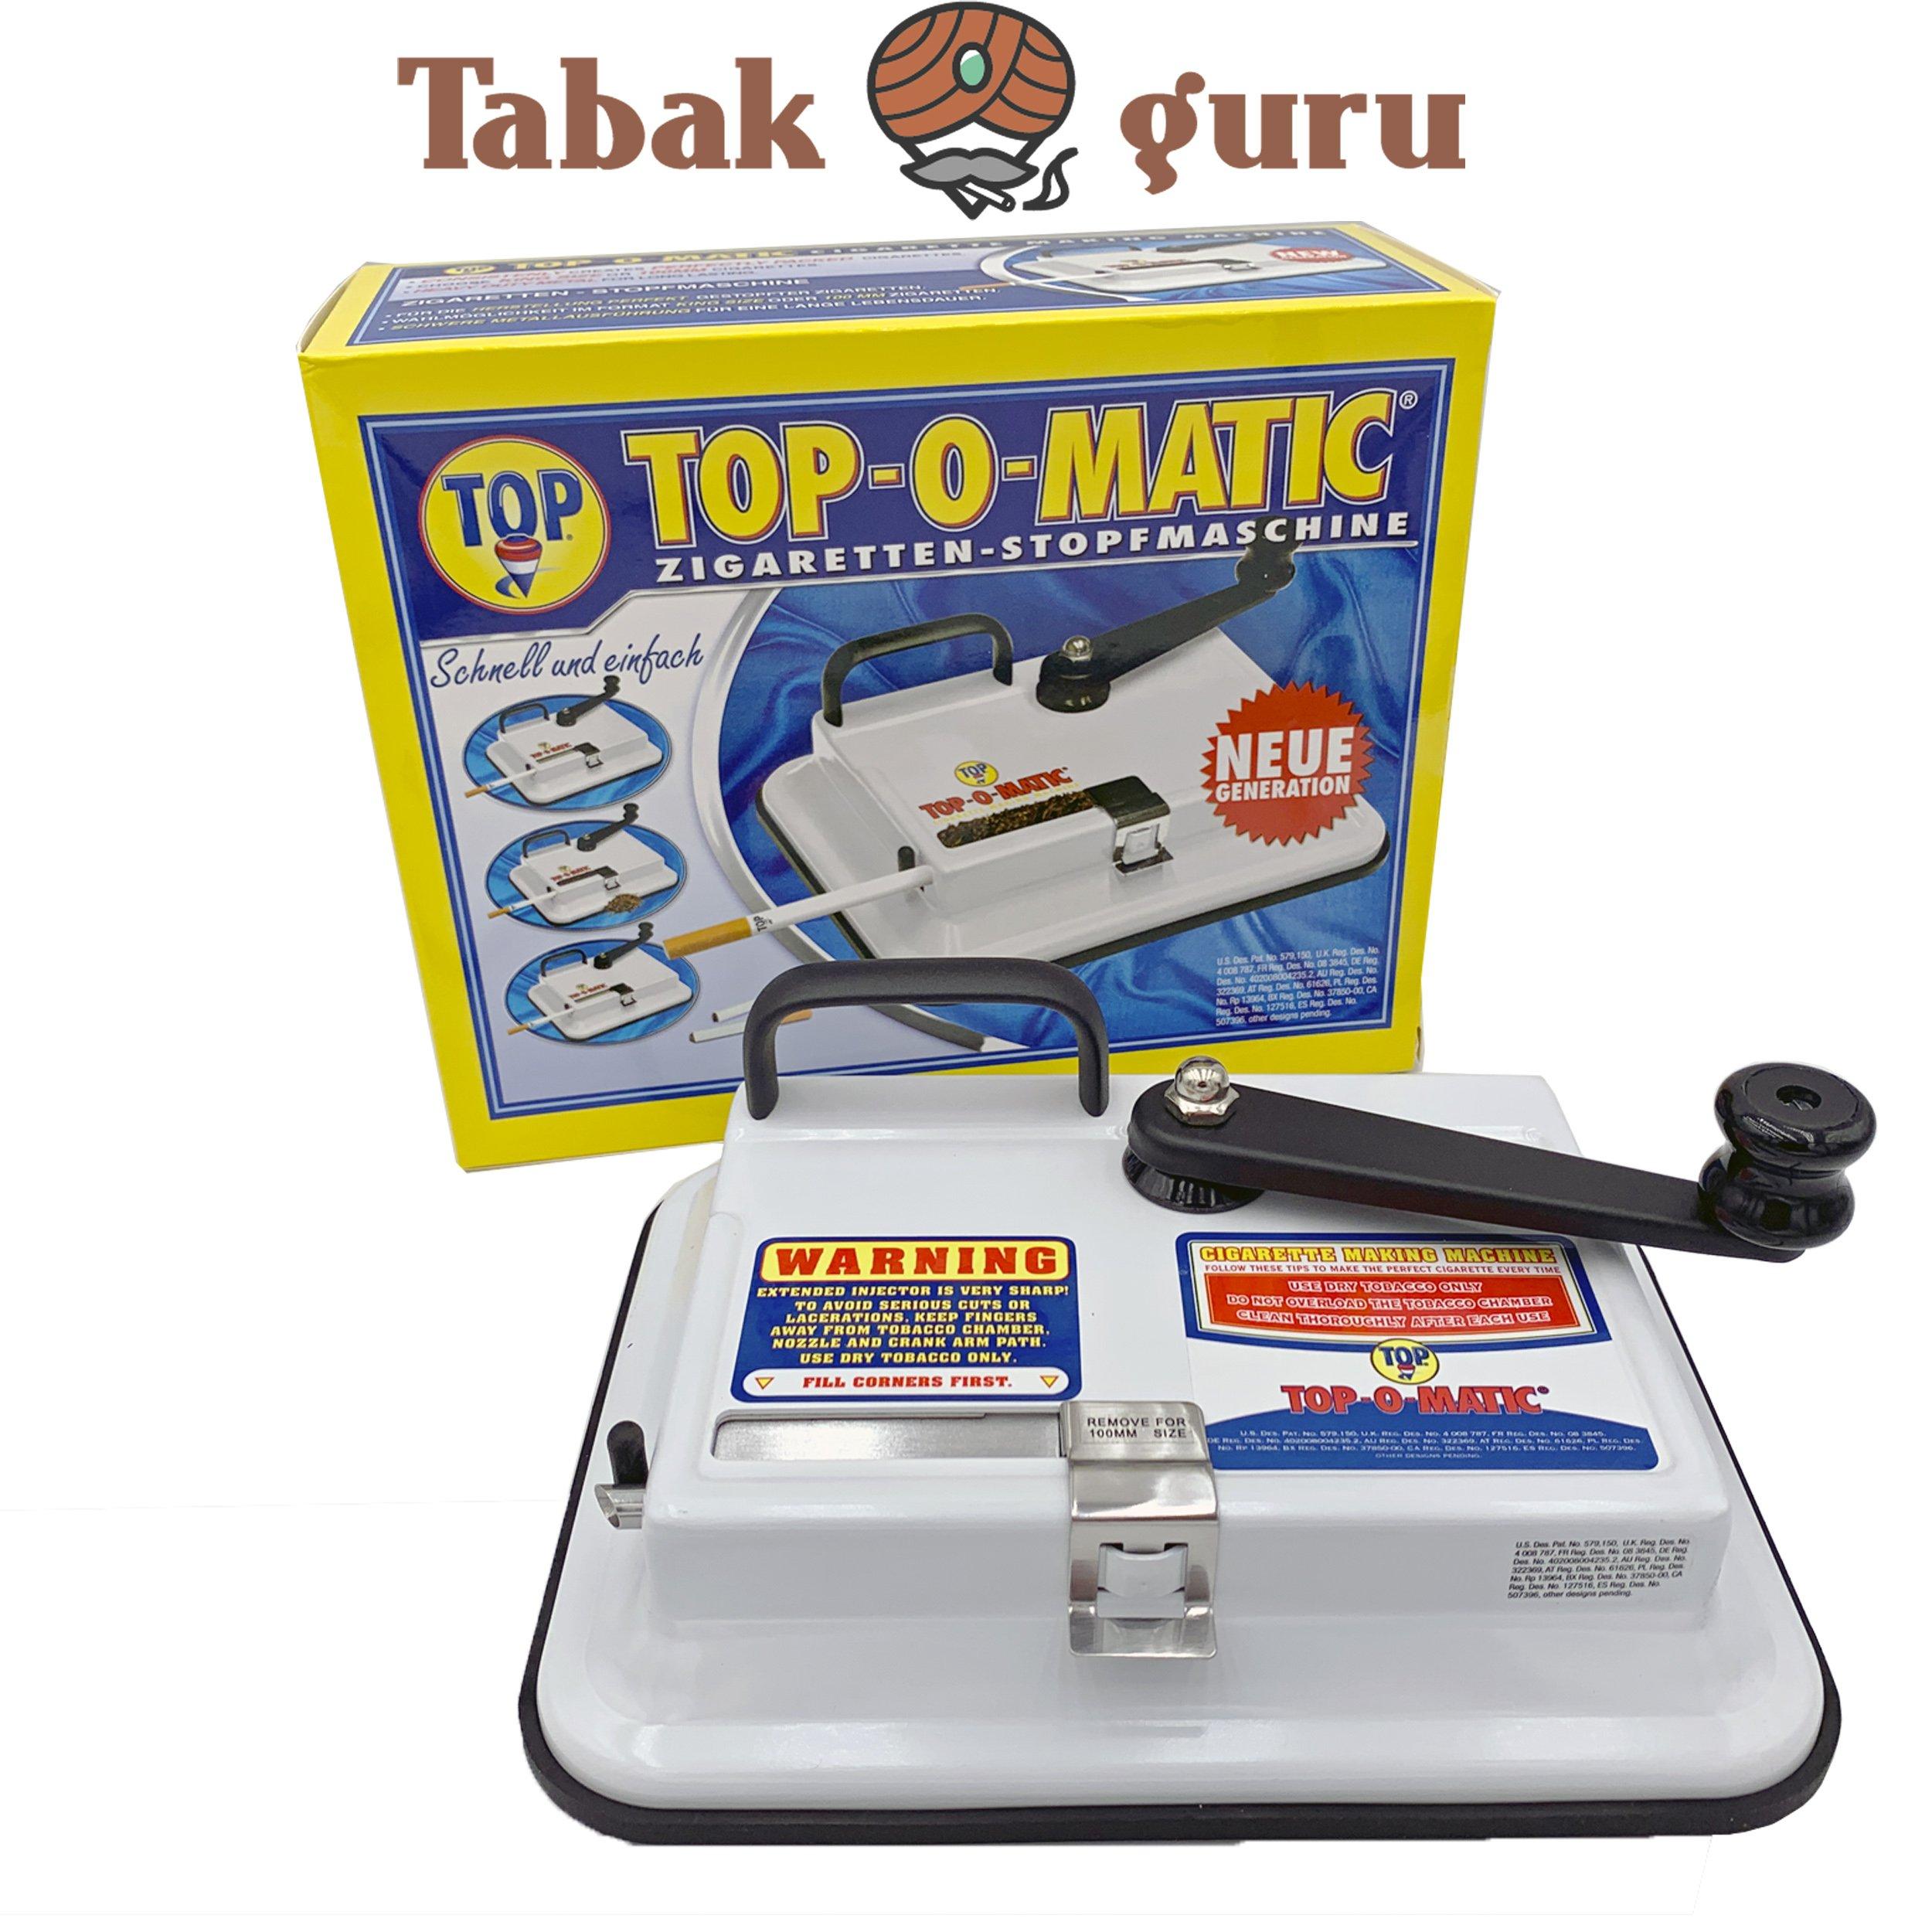 OCB TOP-O-MATIC Stopfmaschine Zigarettenstopfer Zigarettenmaschine TOP-O-MATIC